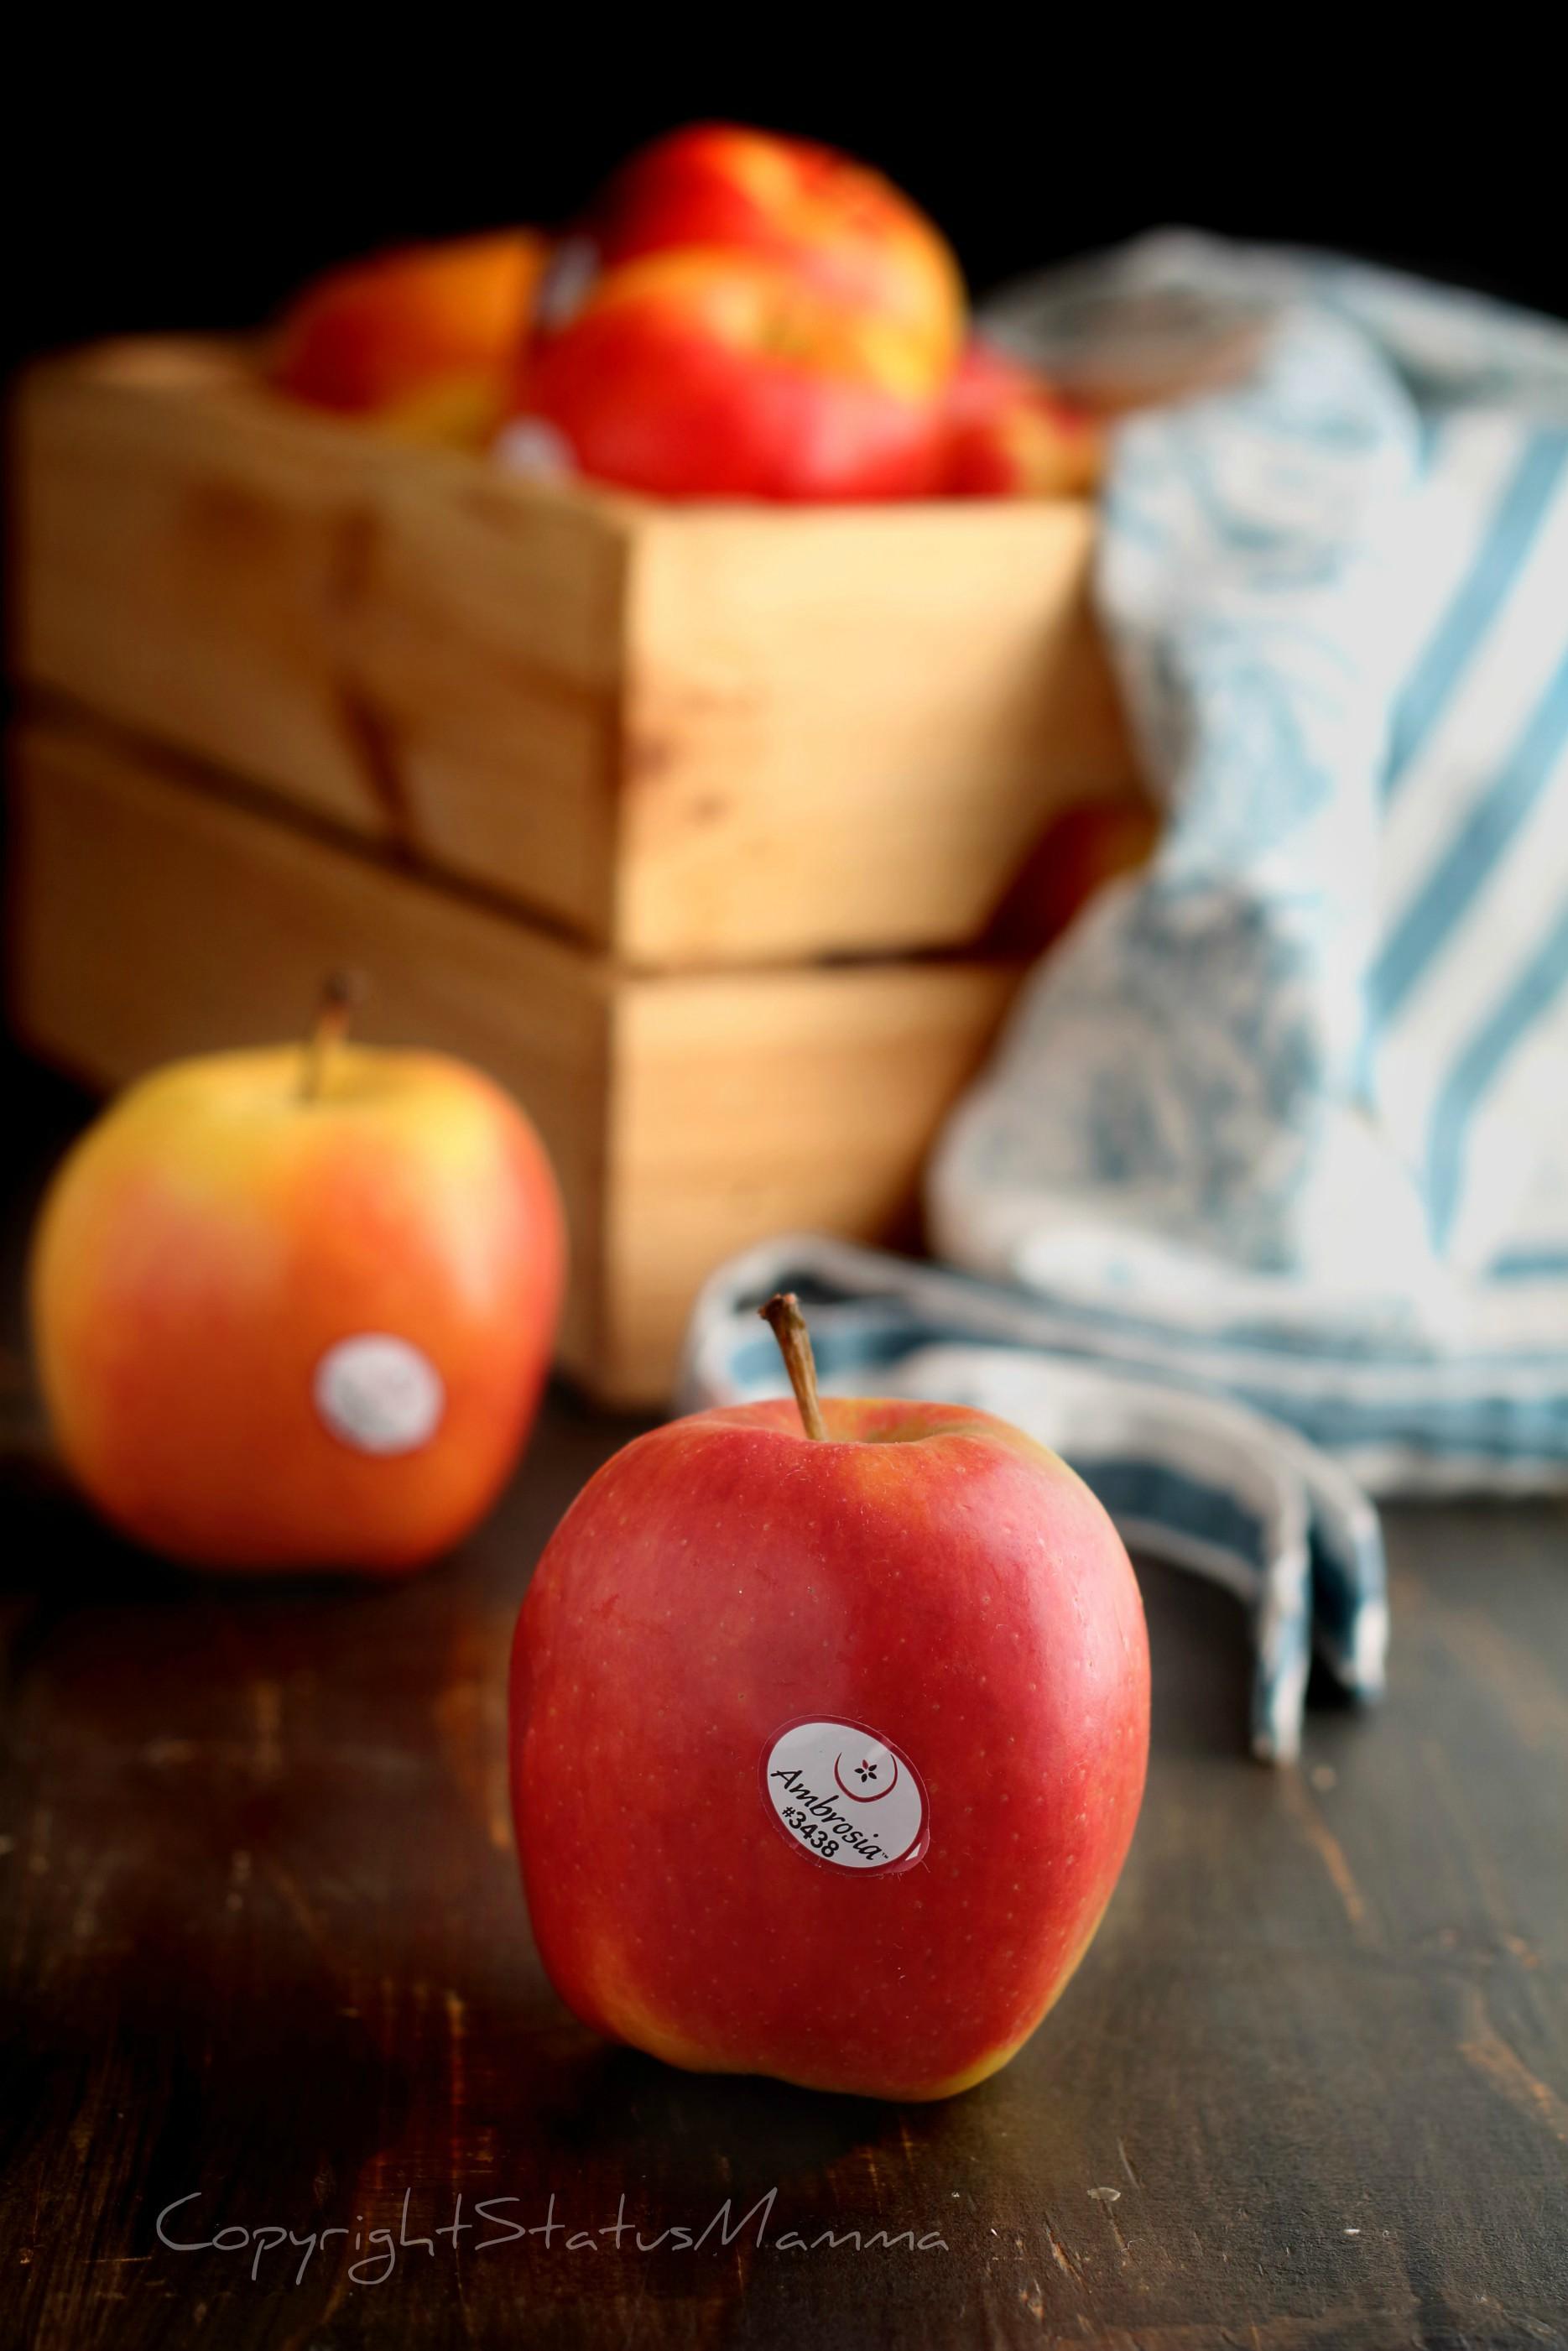 Kung fu panda pancake con purea di mele - tutorial facile mela mele rivoira